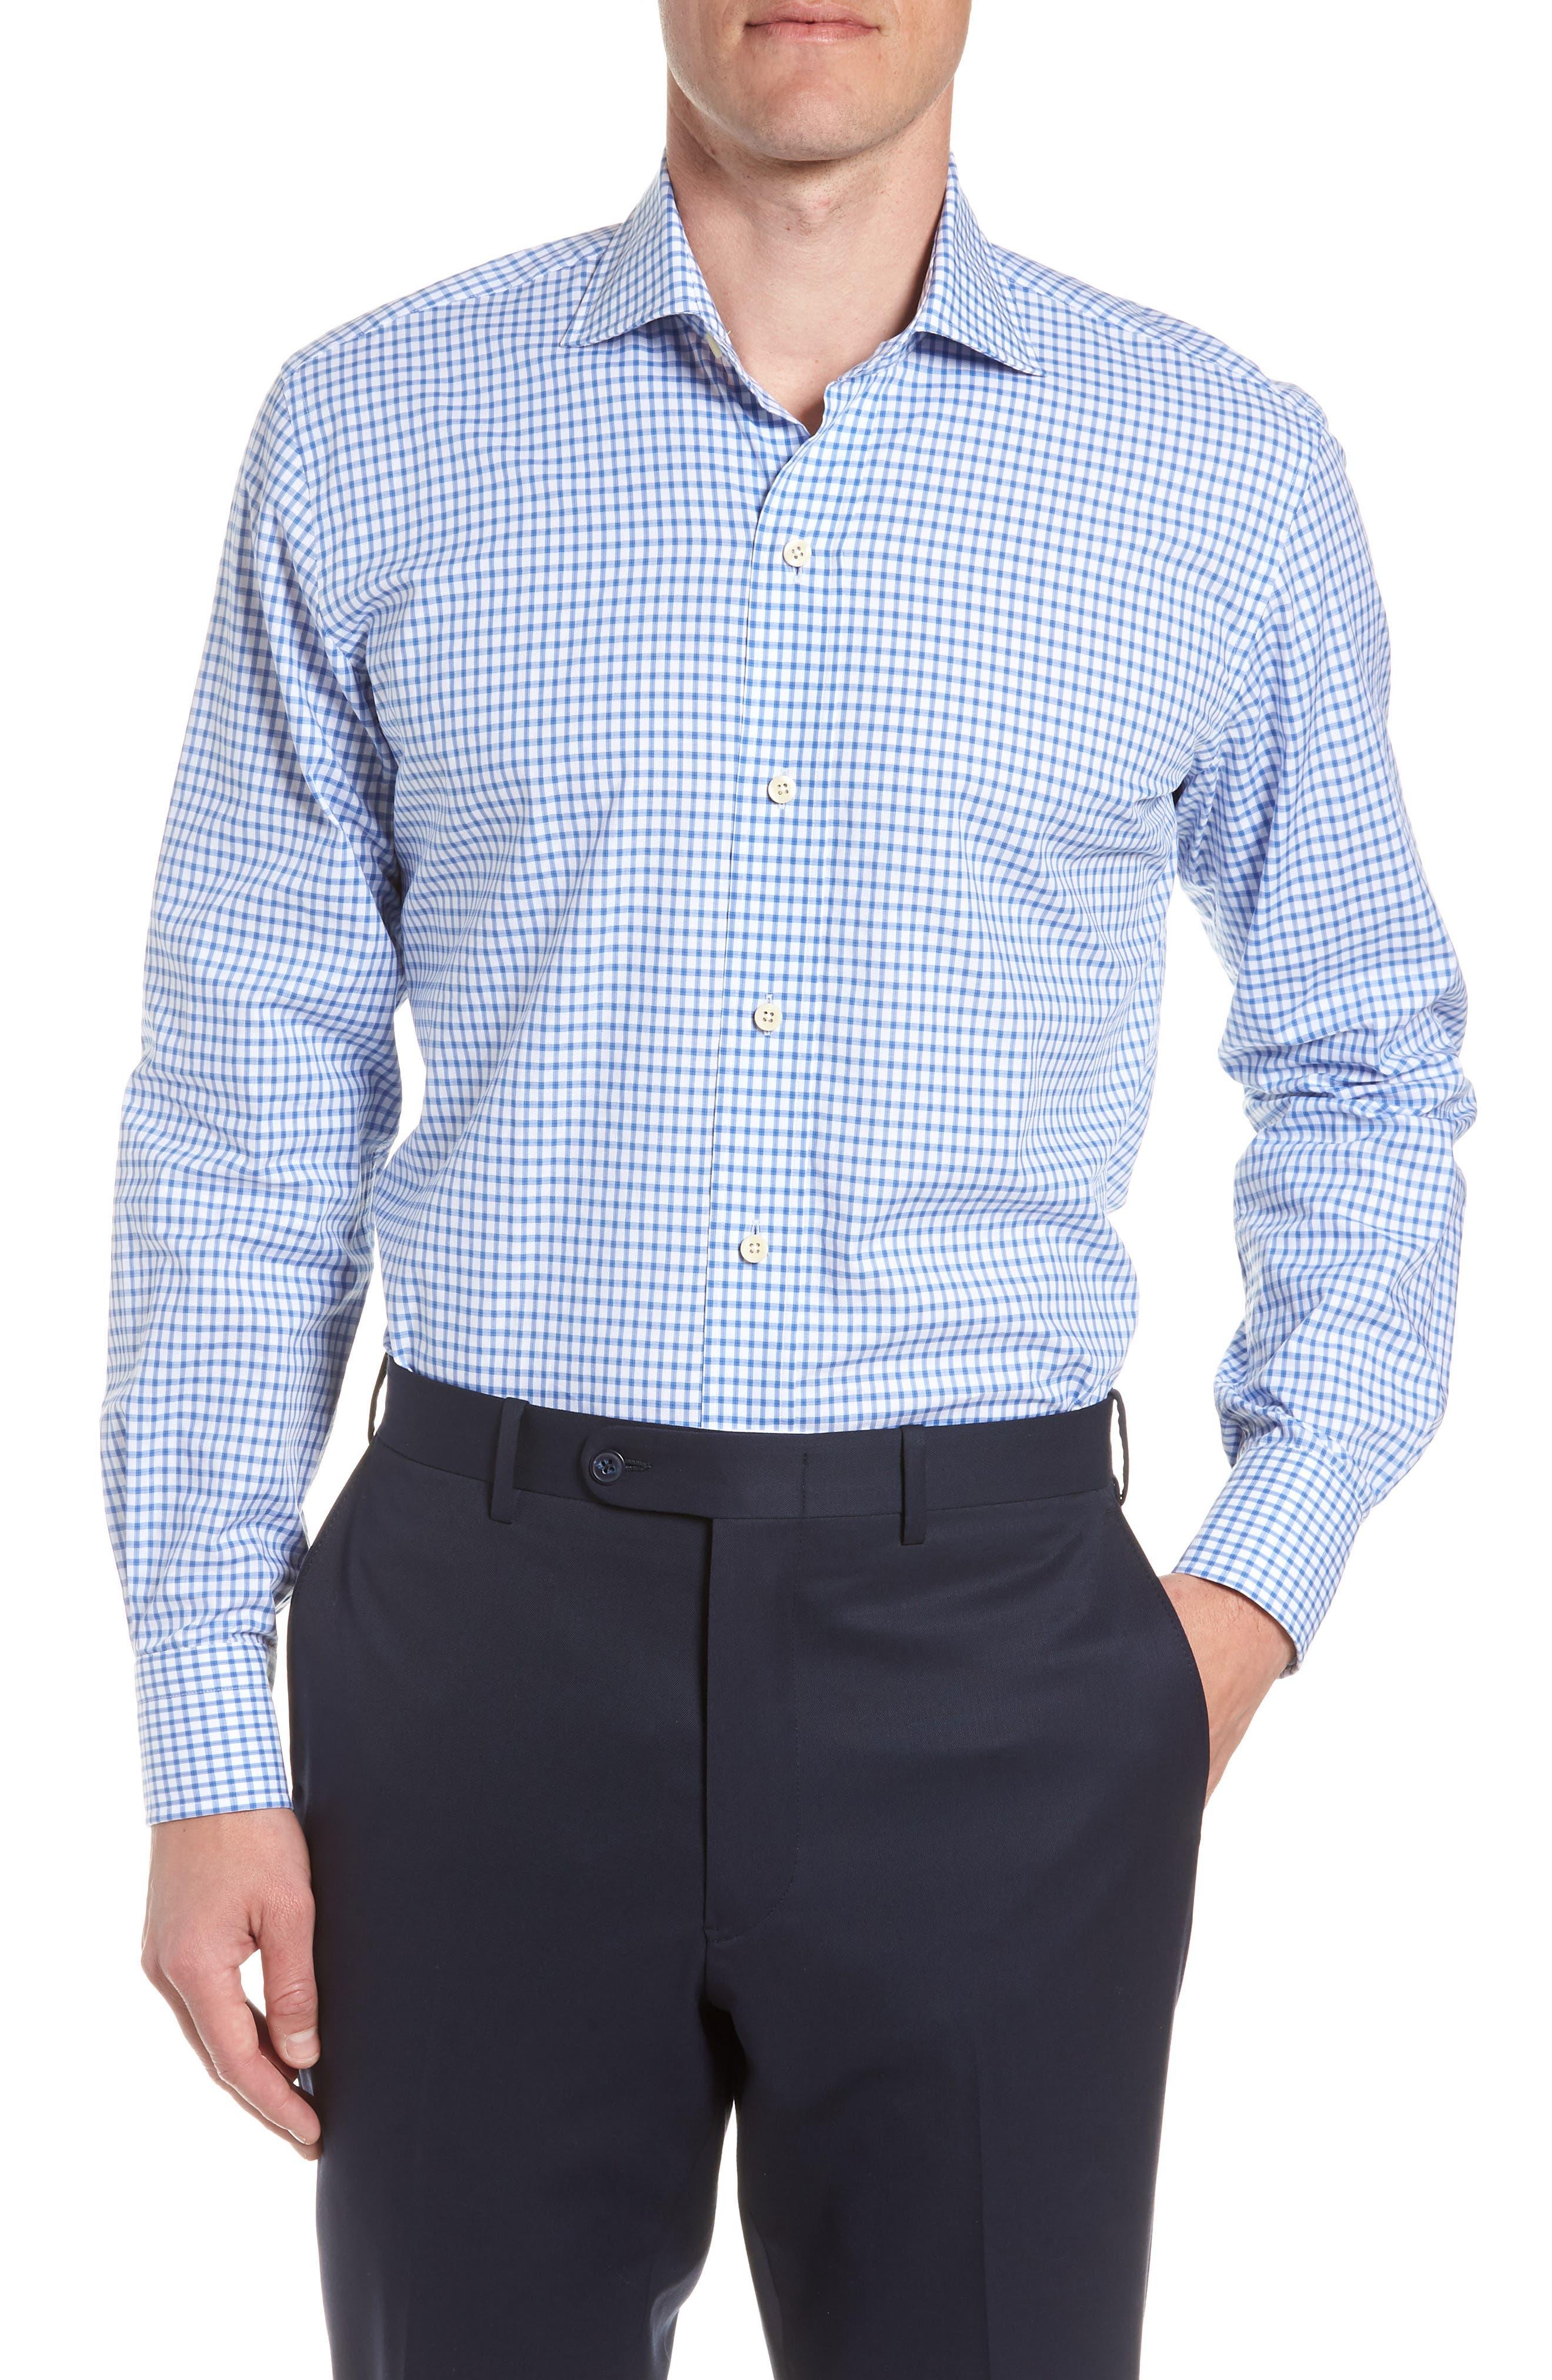 Garrison Slim Fit Check Dress Shirt,                         Main,                         color,